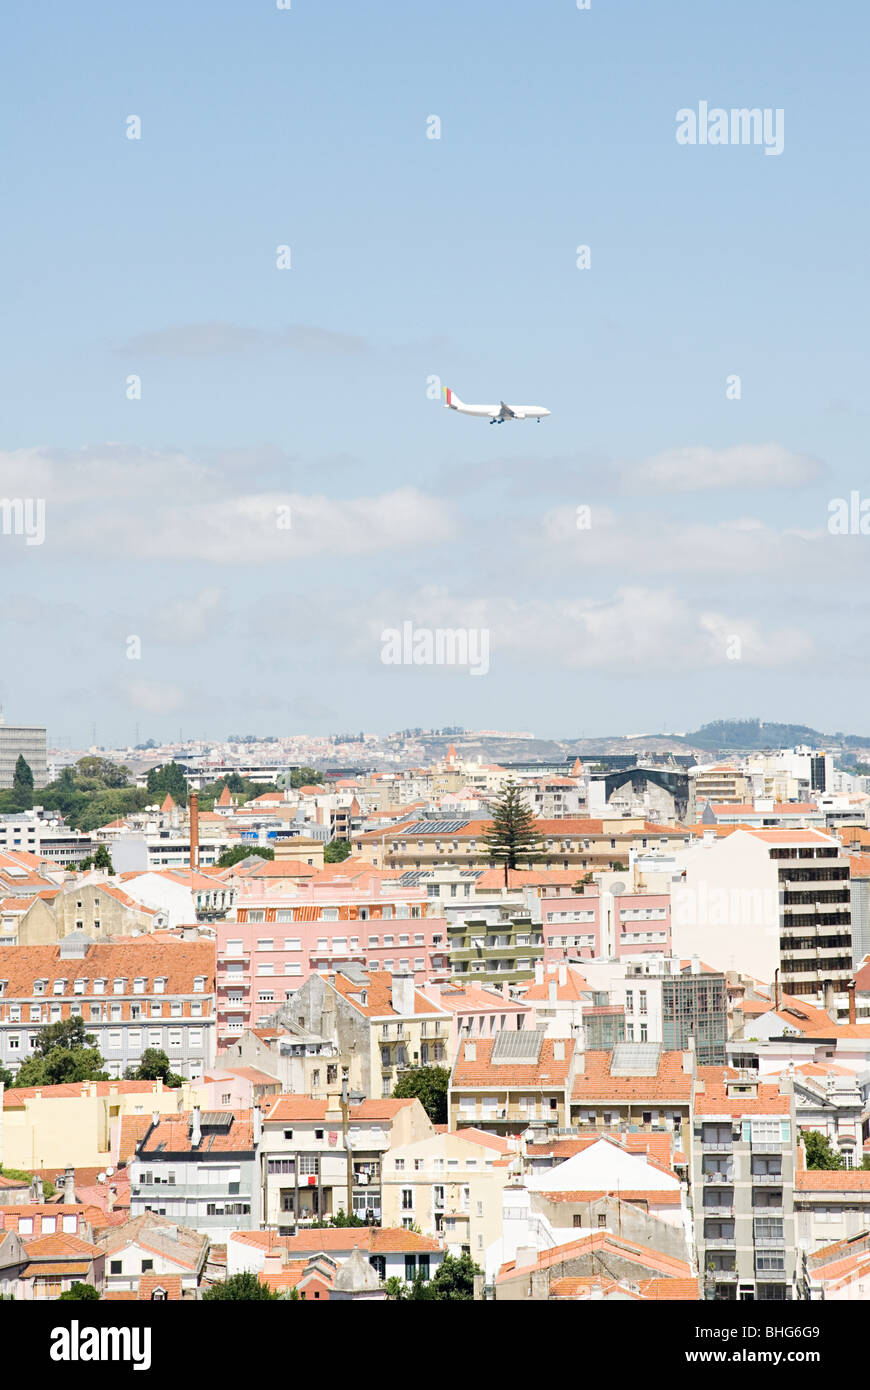 Airplane above lisbon - Stock Image